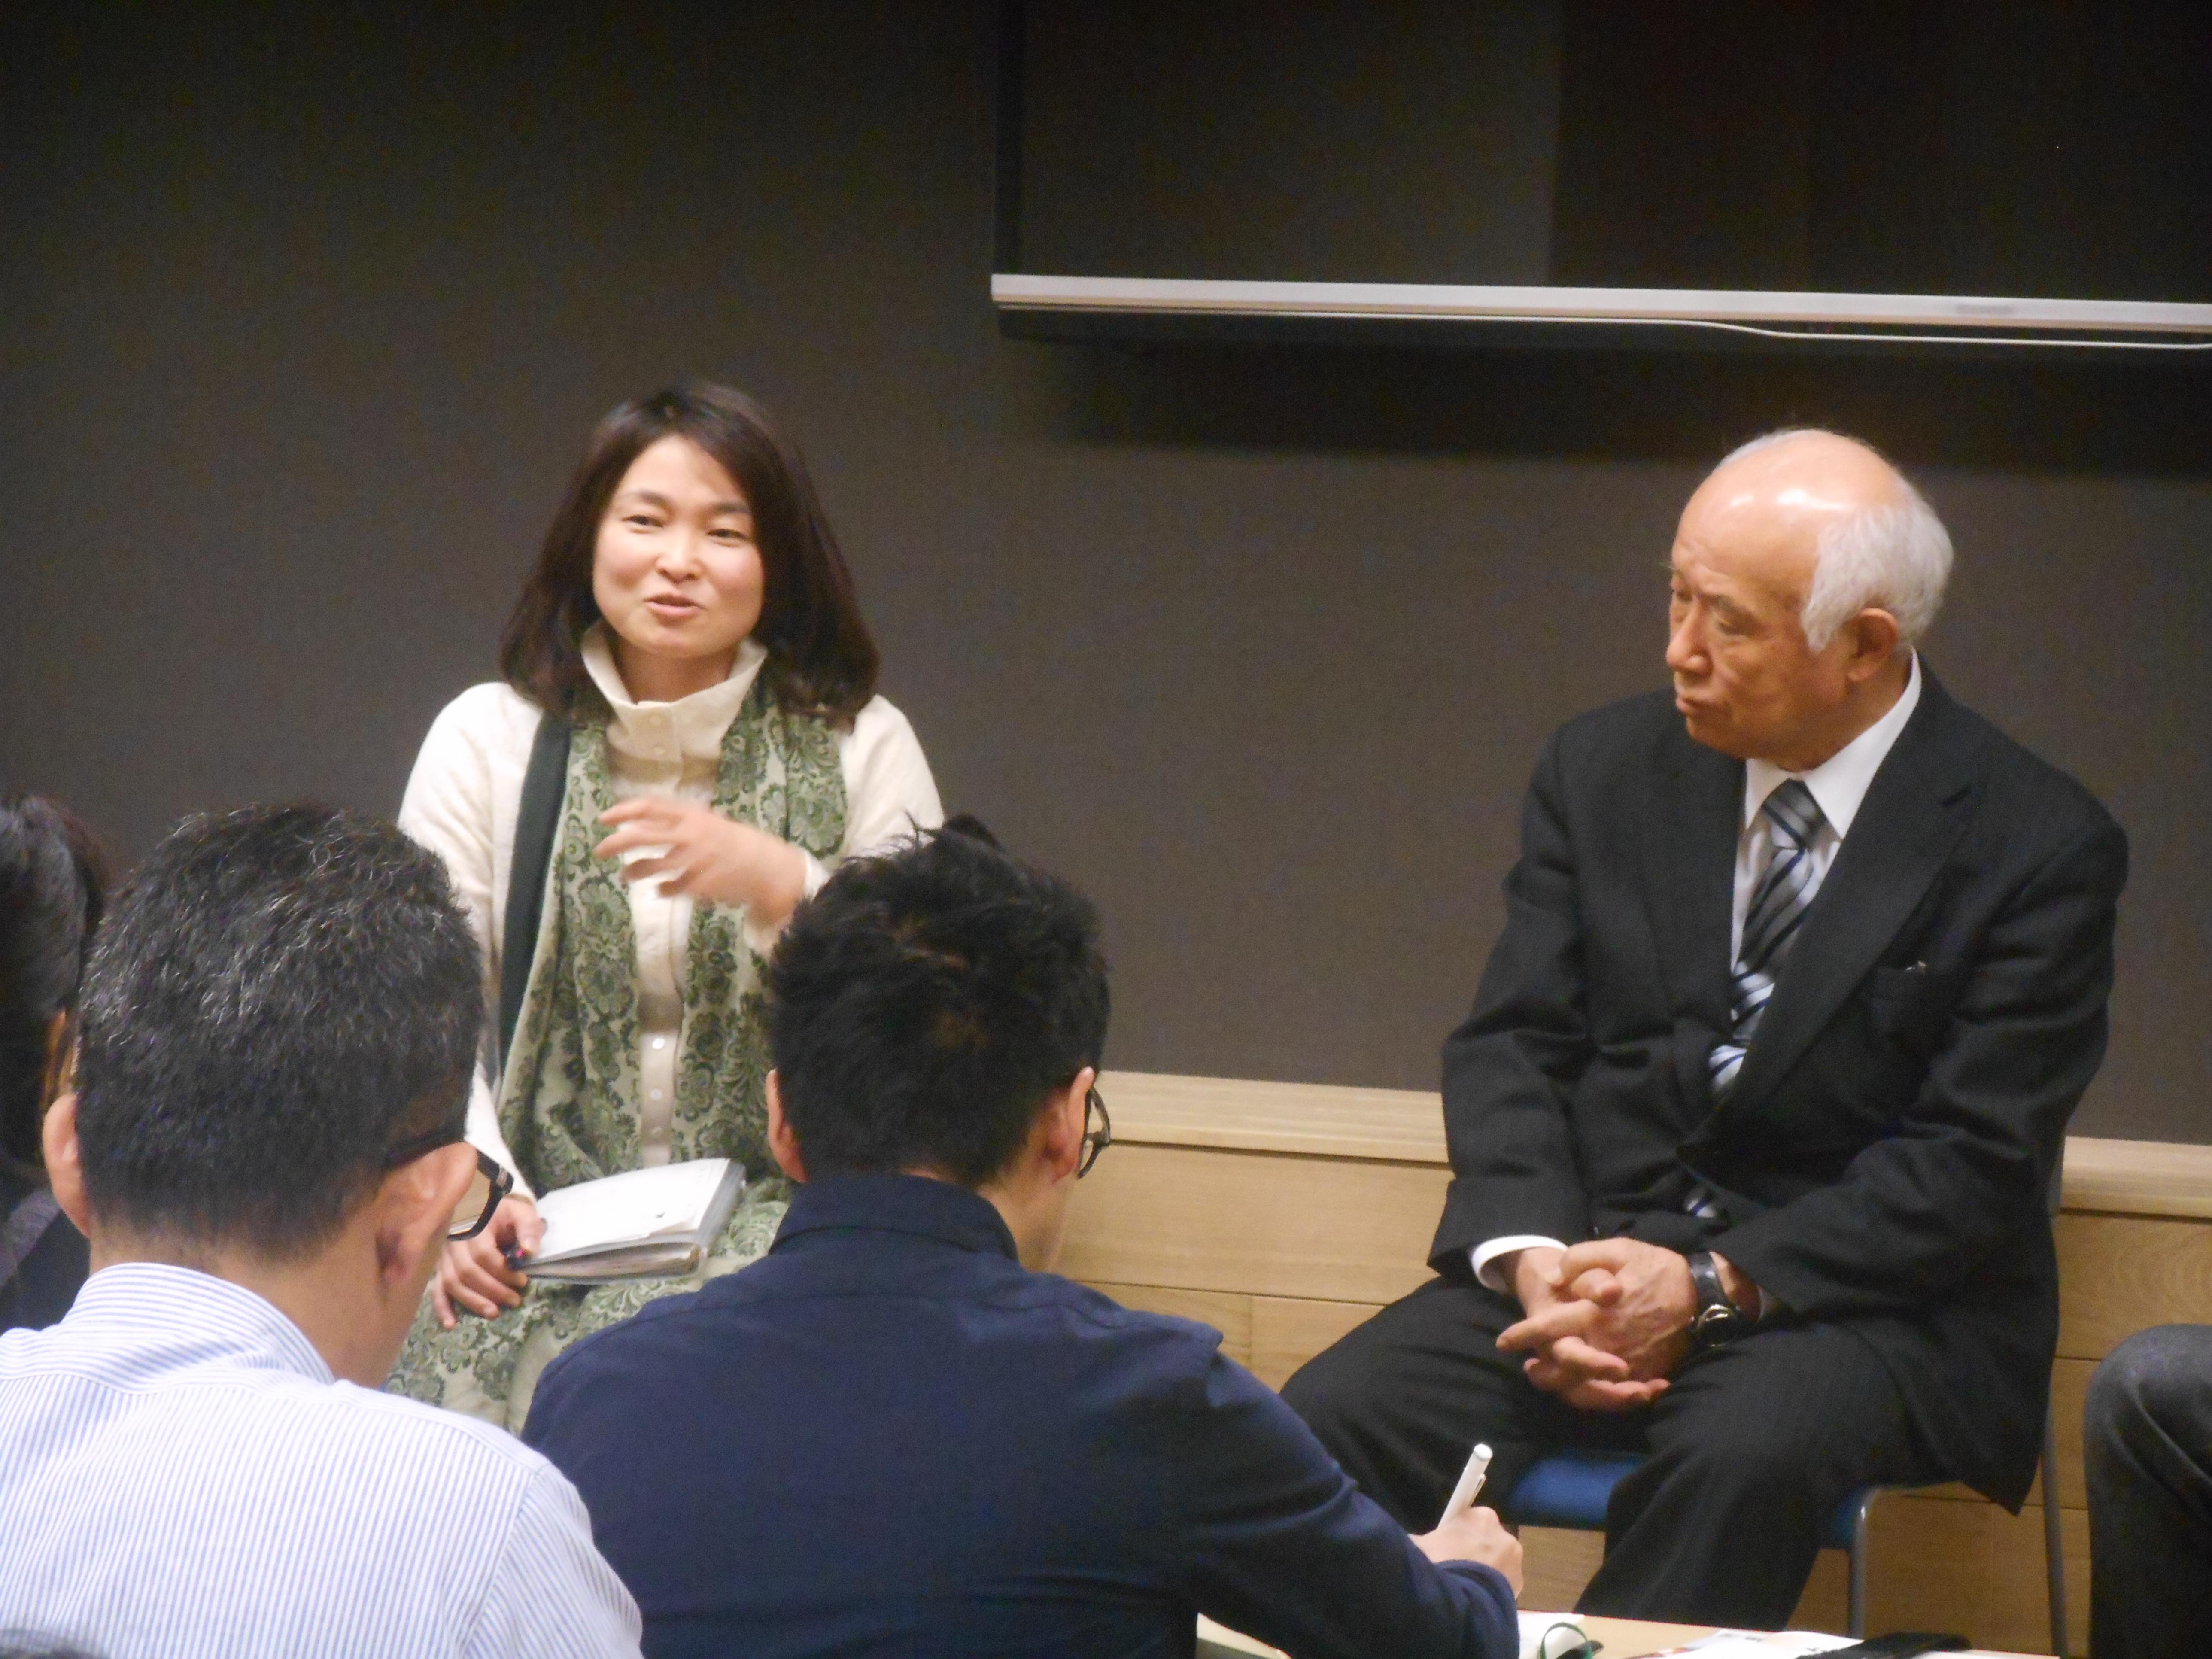 DSCN0489 - 4月1日東京思風塾の開催になります。